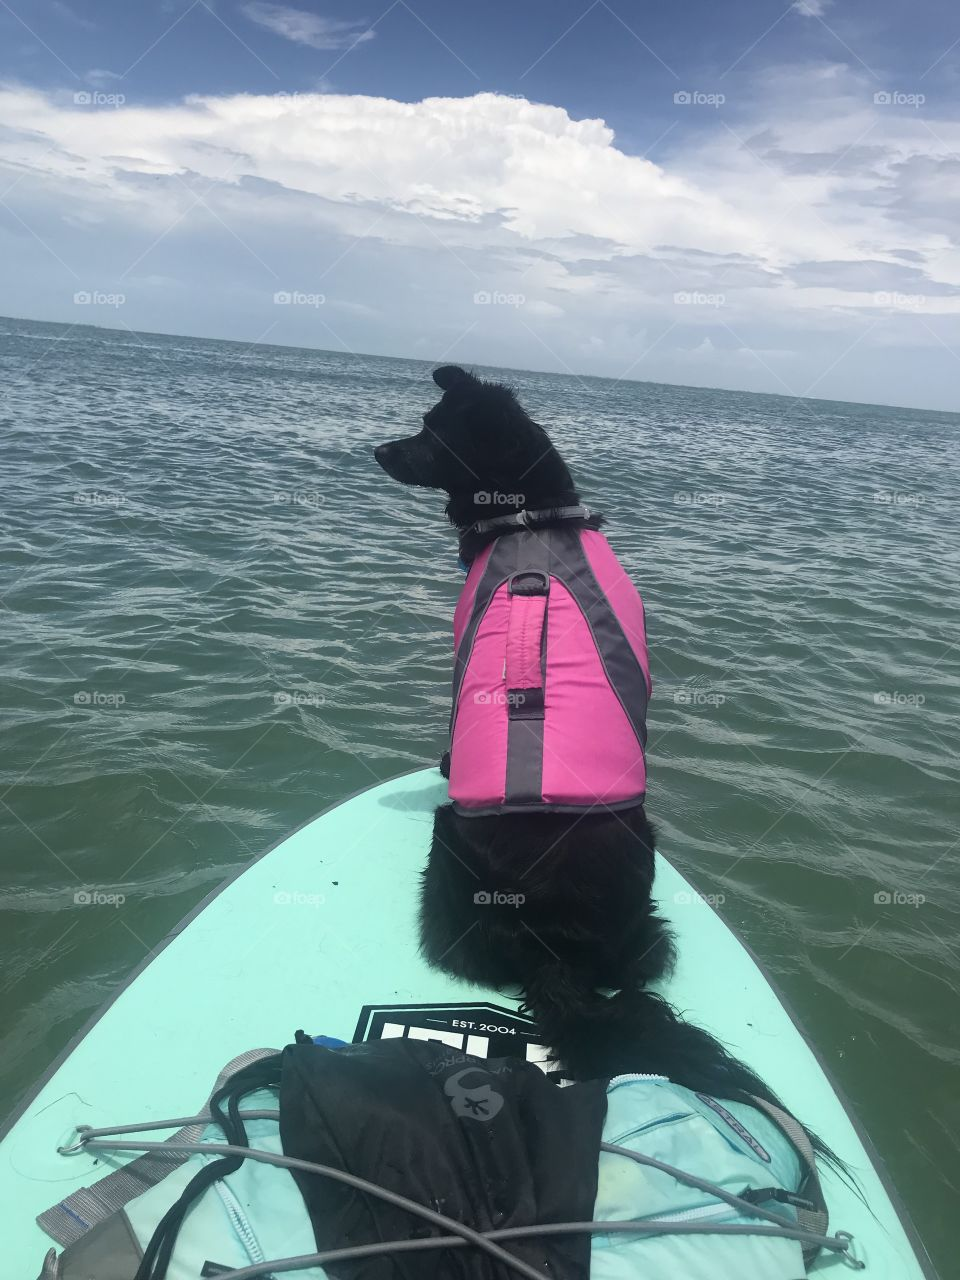 Ocean Paddle Boarding